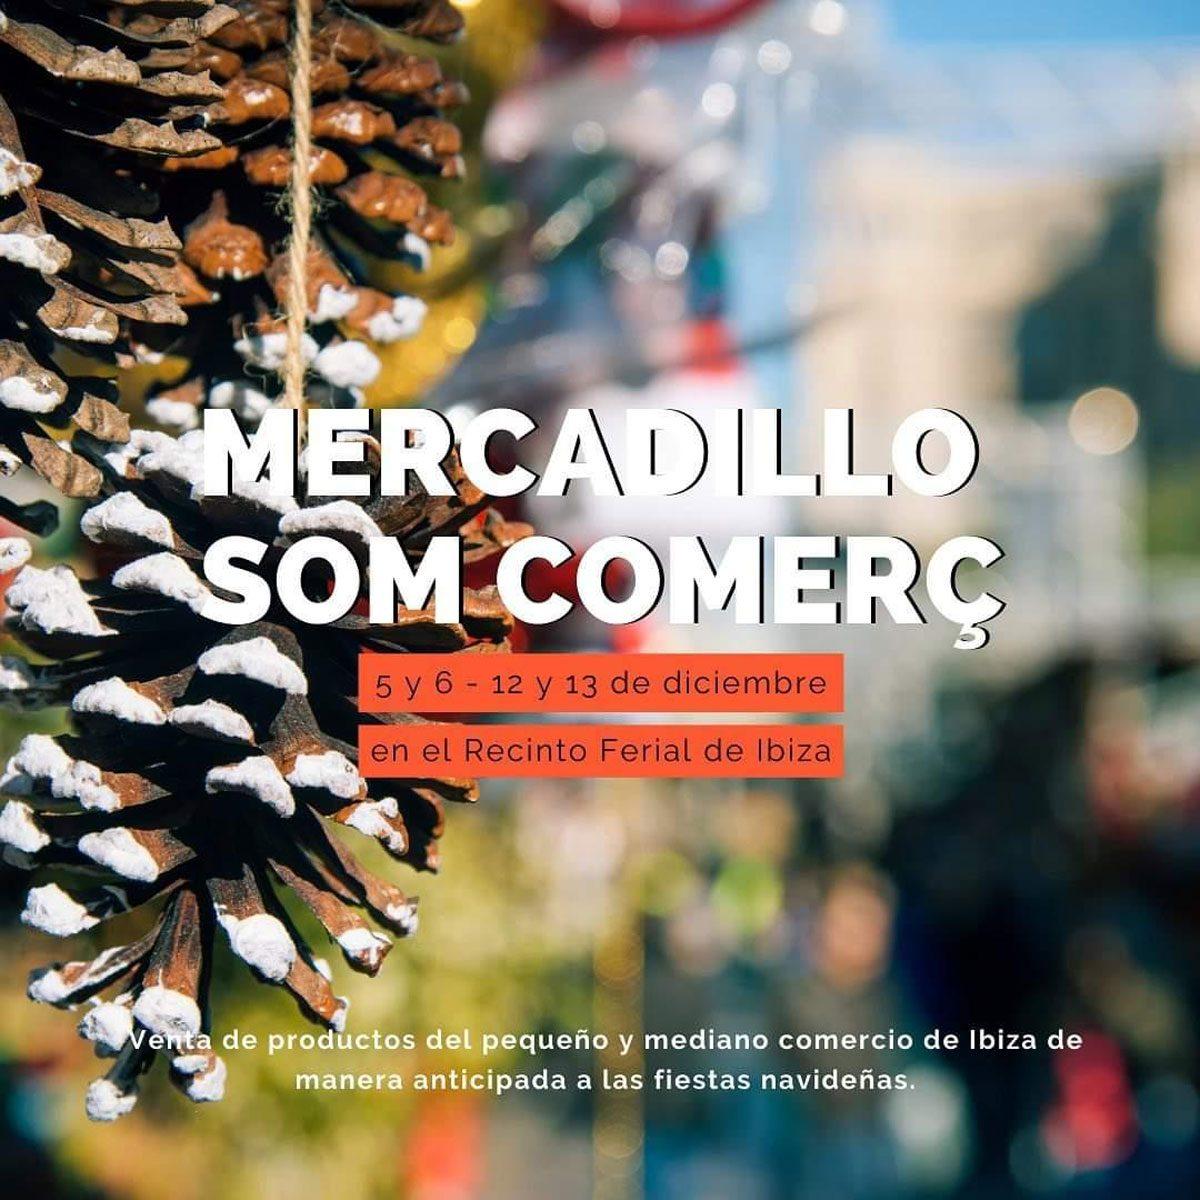 mercat-som-comerc-mercat-nadal-Eivissa-2020-welcometoibiza